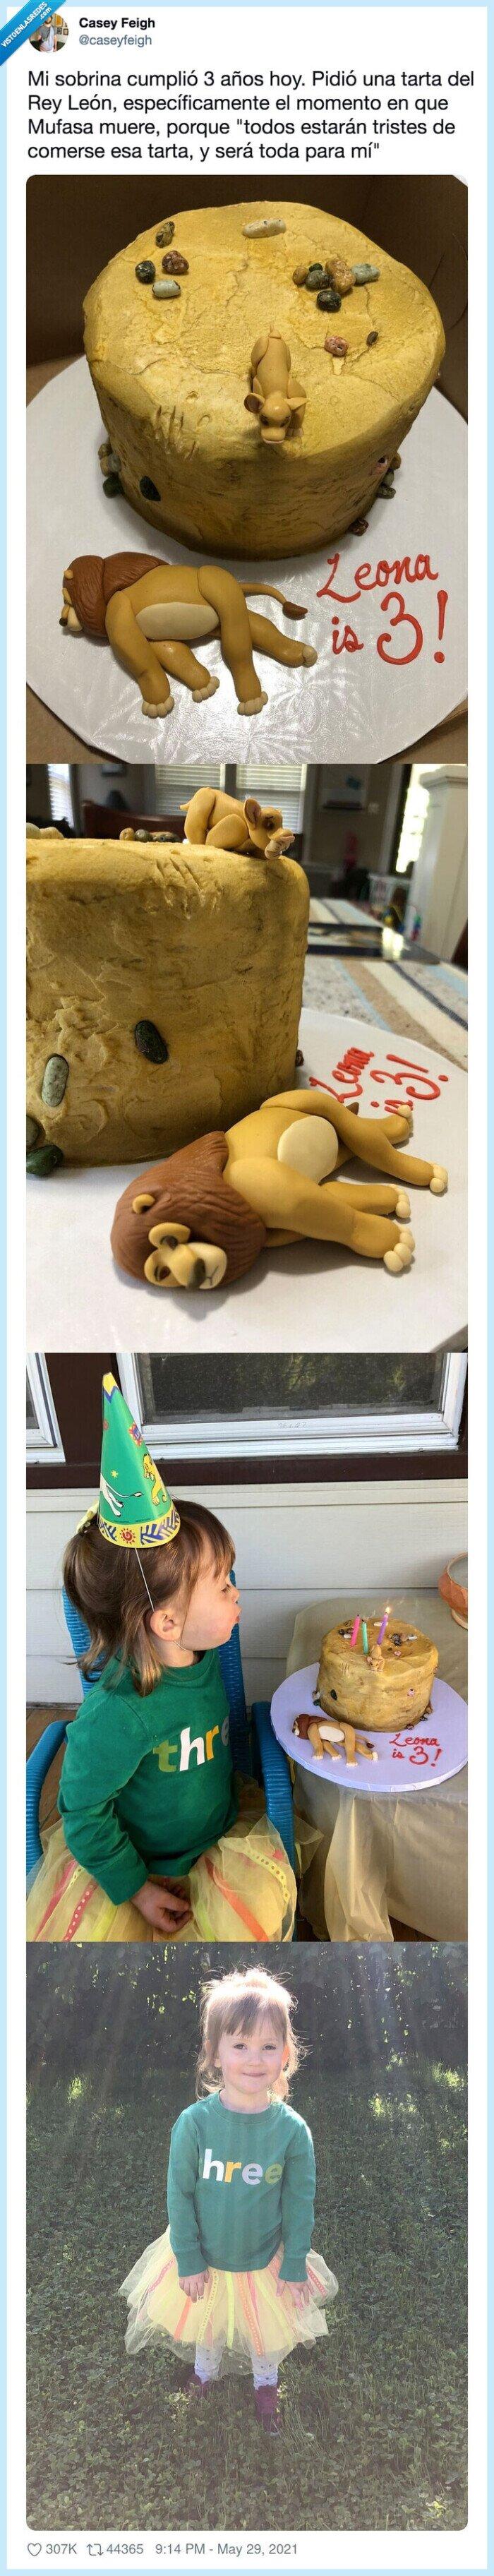 el rey león,muerte,mufasa,tarta